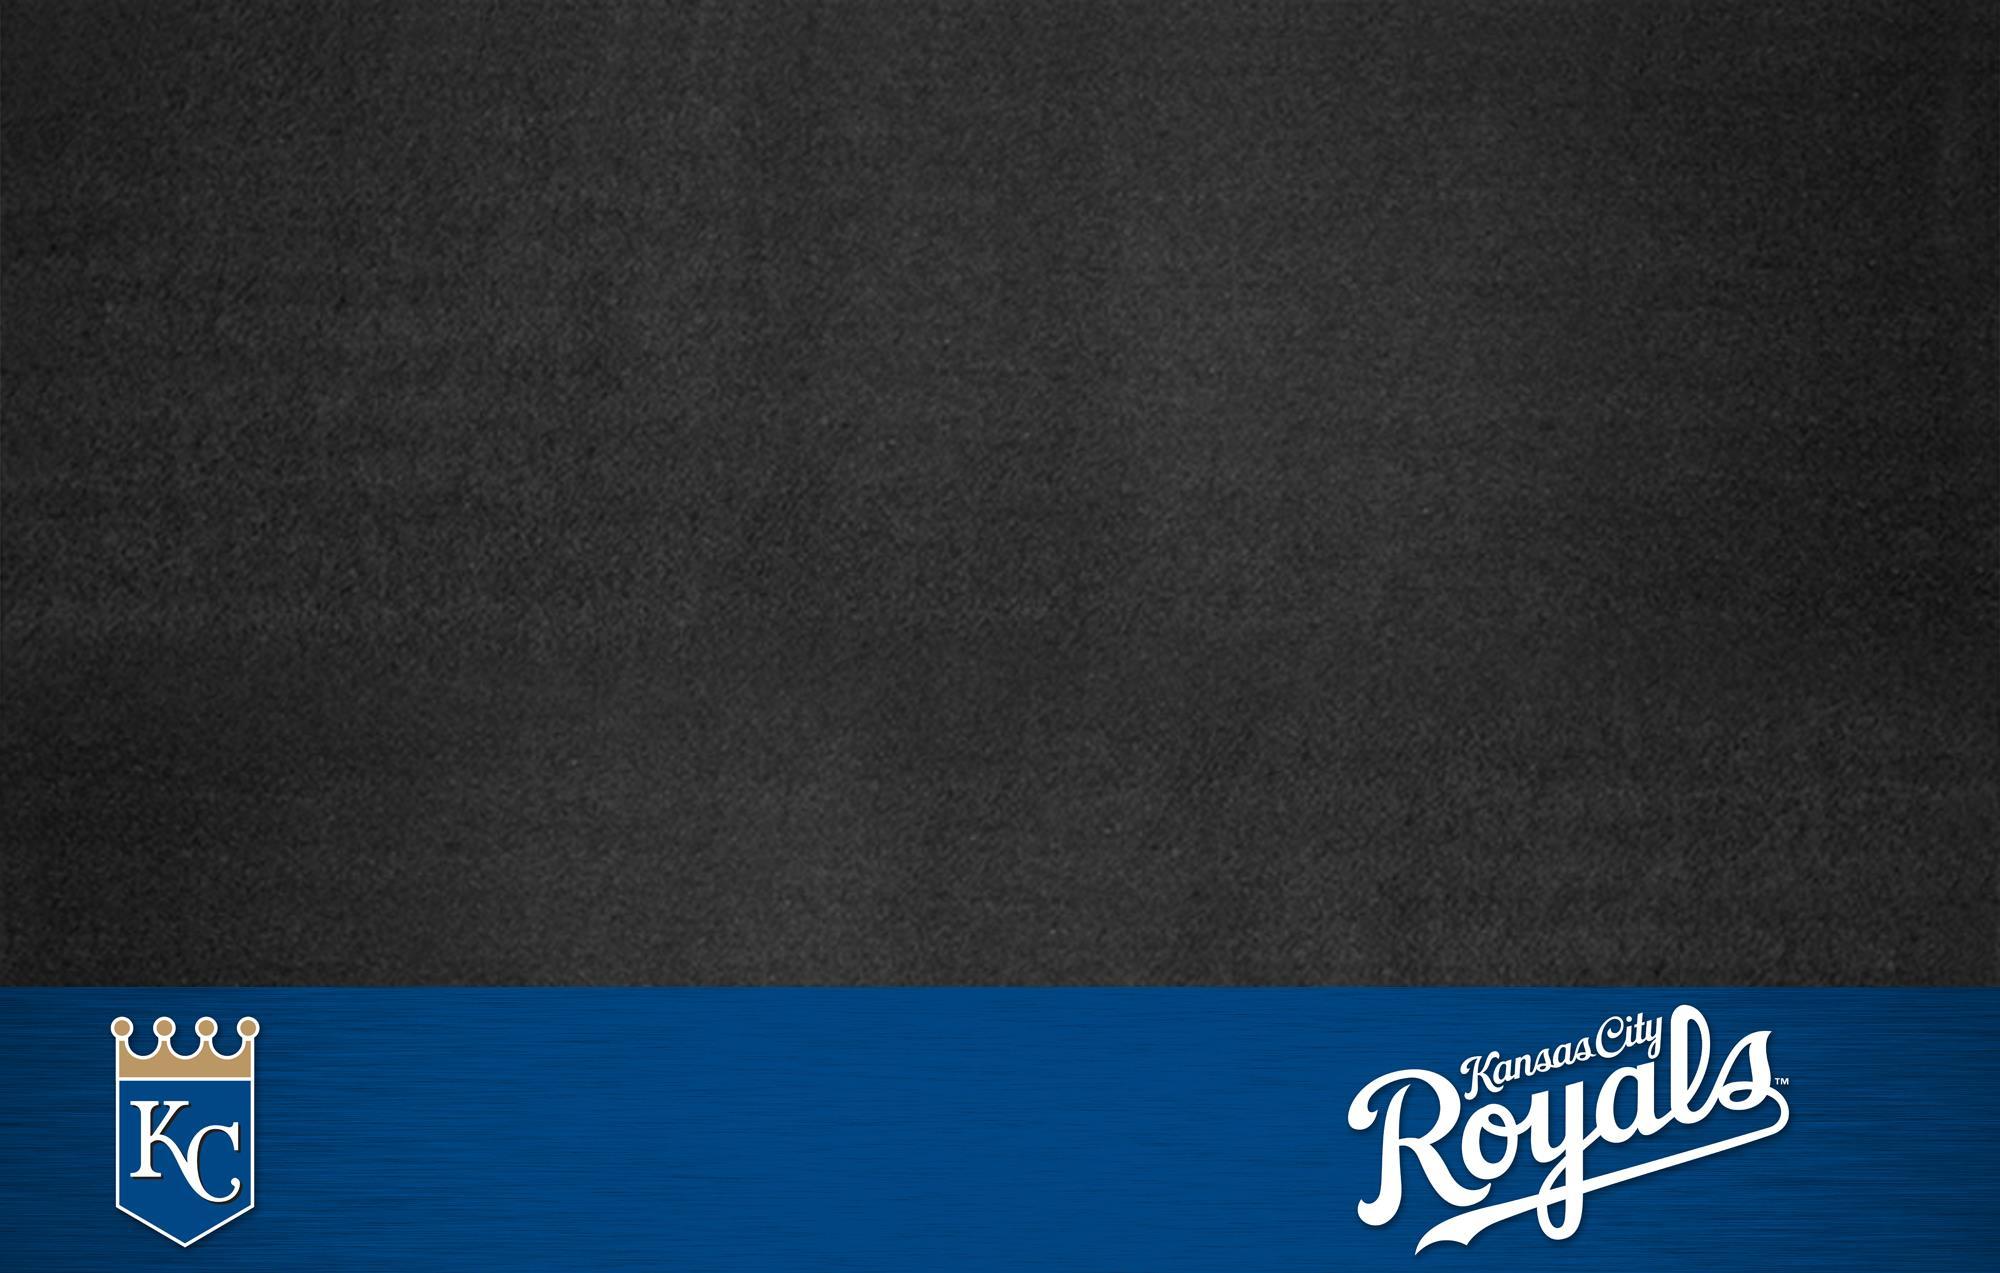 KANSAS CITY ROYALS mlb baseball 38 wallpaper background 2000x1273